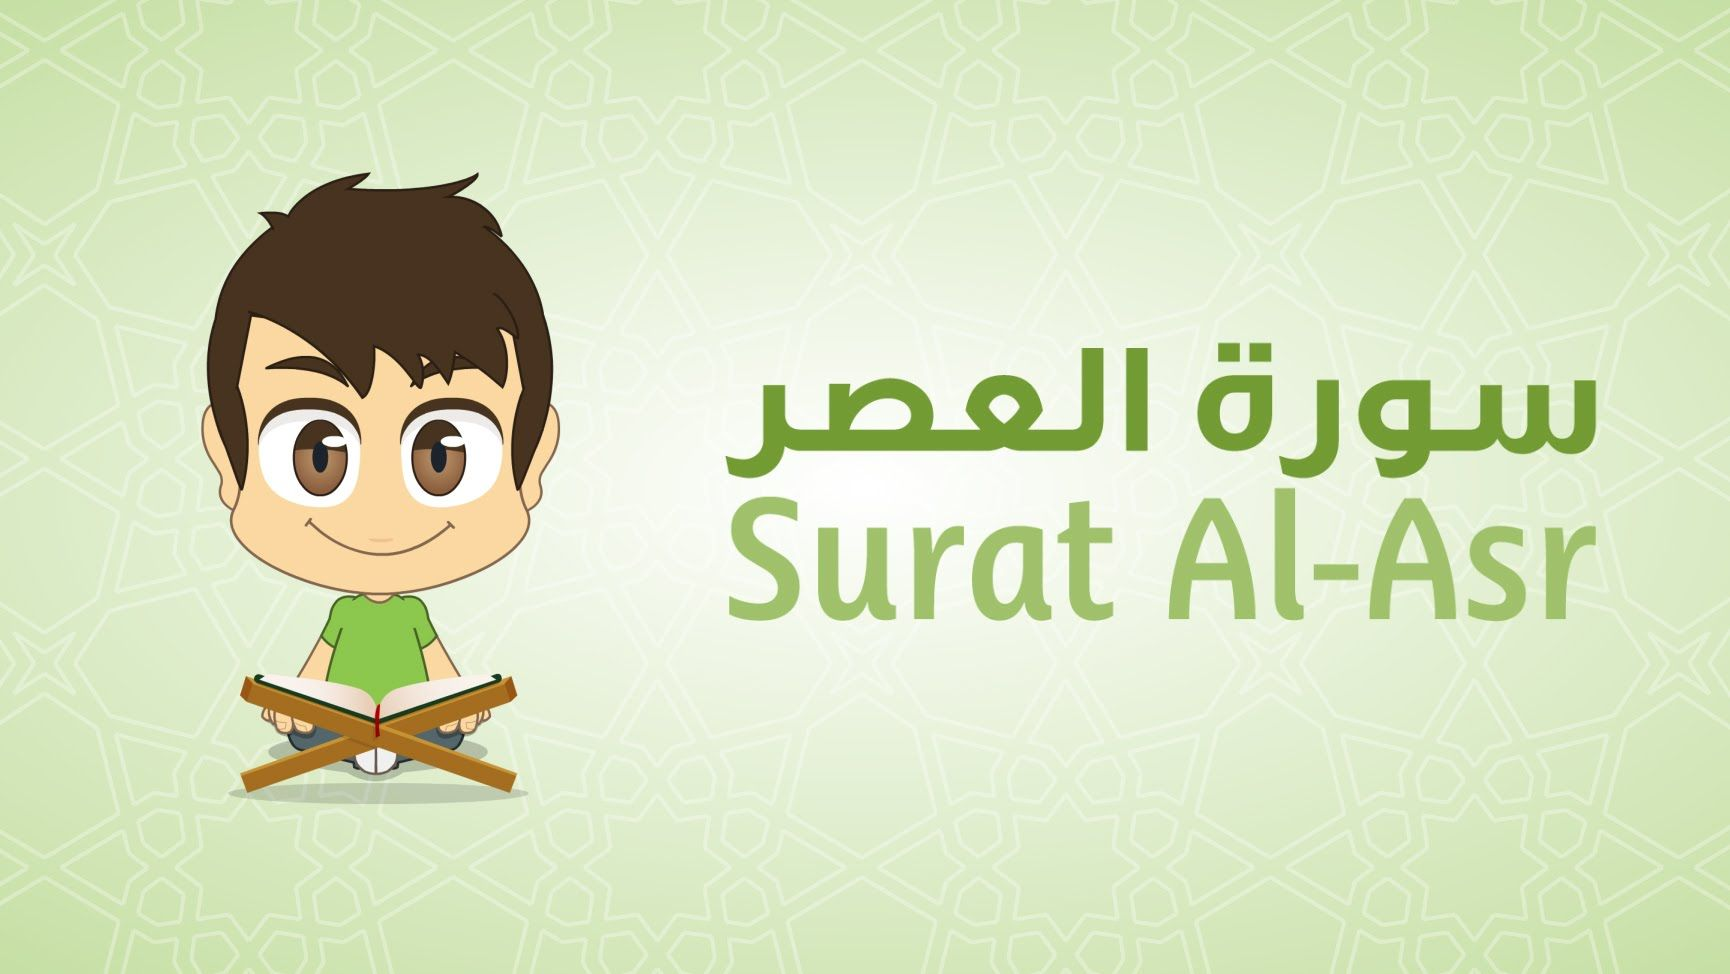 Quran For Kids Learn Surah Al Asr 103 القرآن الكريم للأطفال تعل م سورة العصر Kids Learning Learn Quran Learning